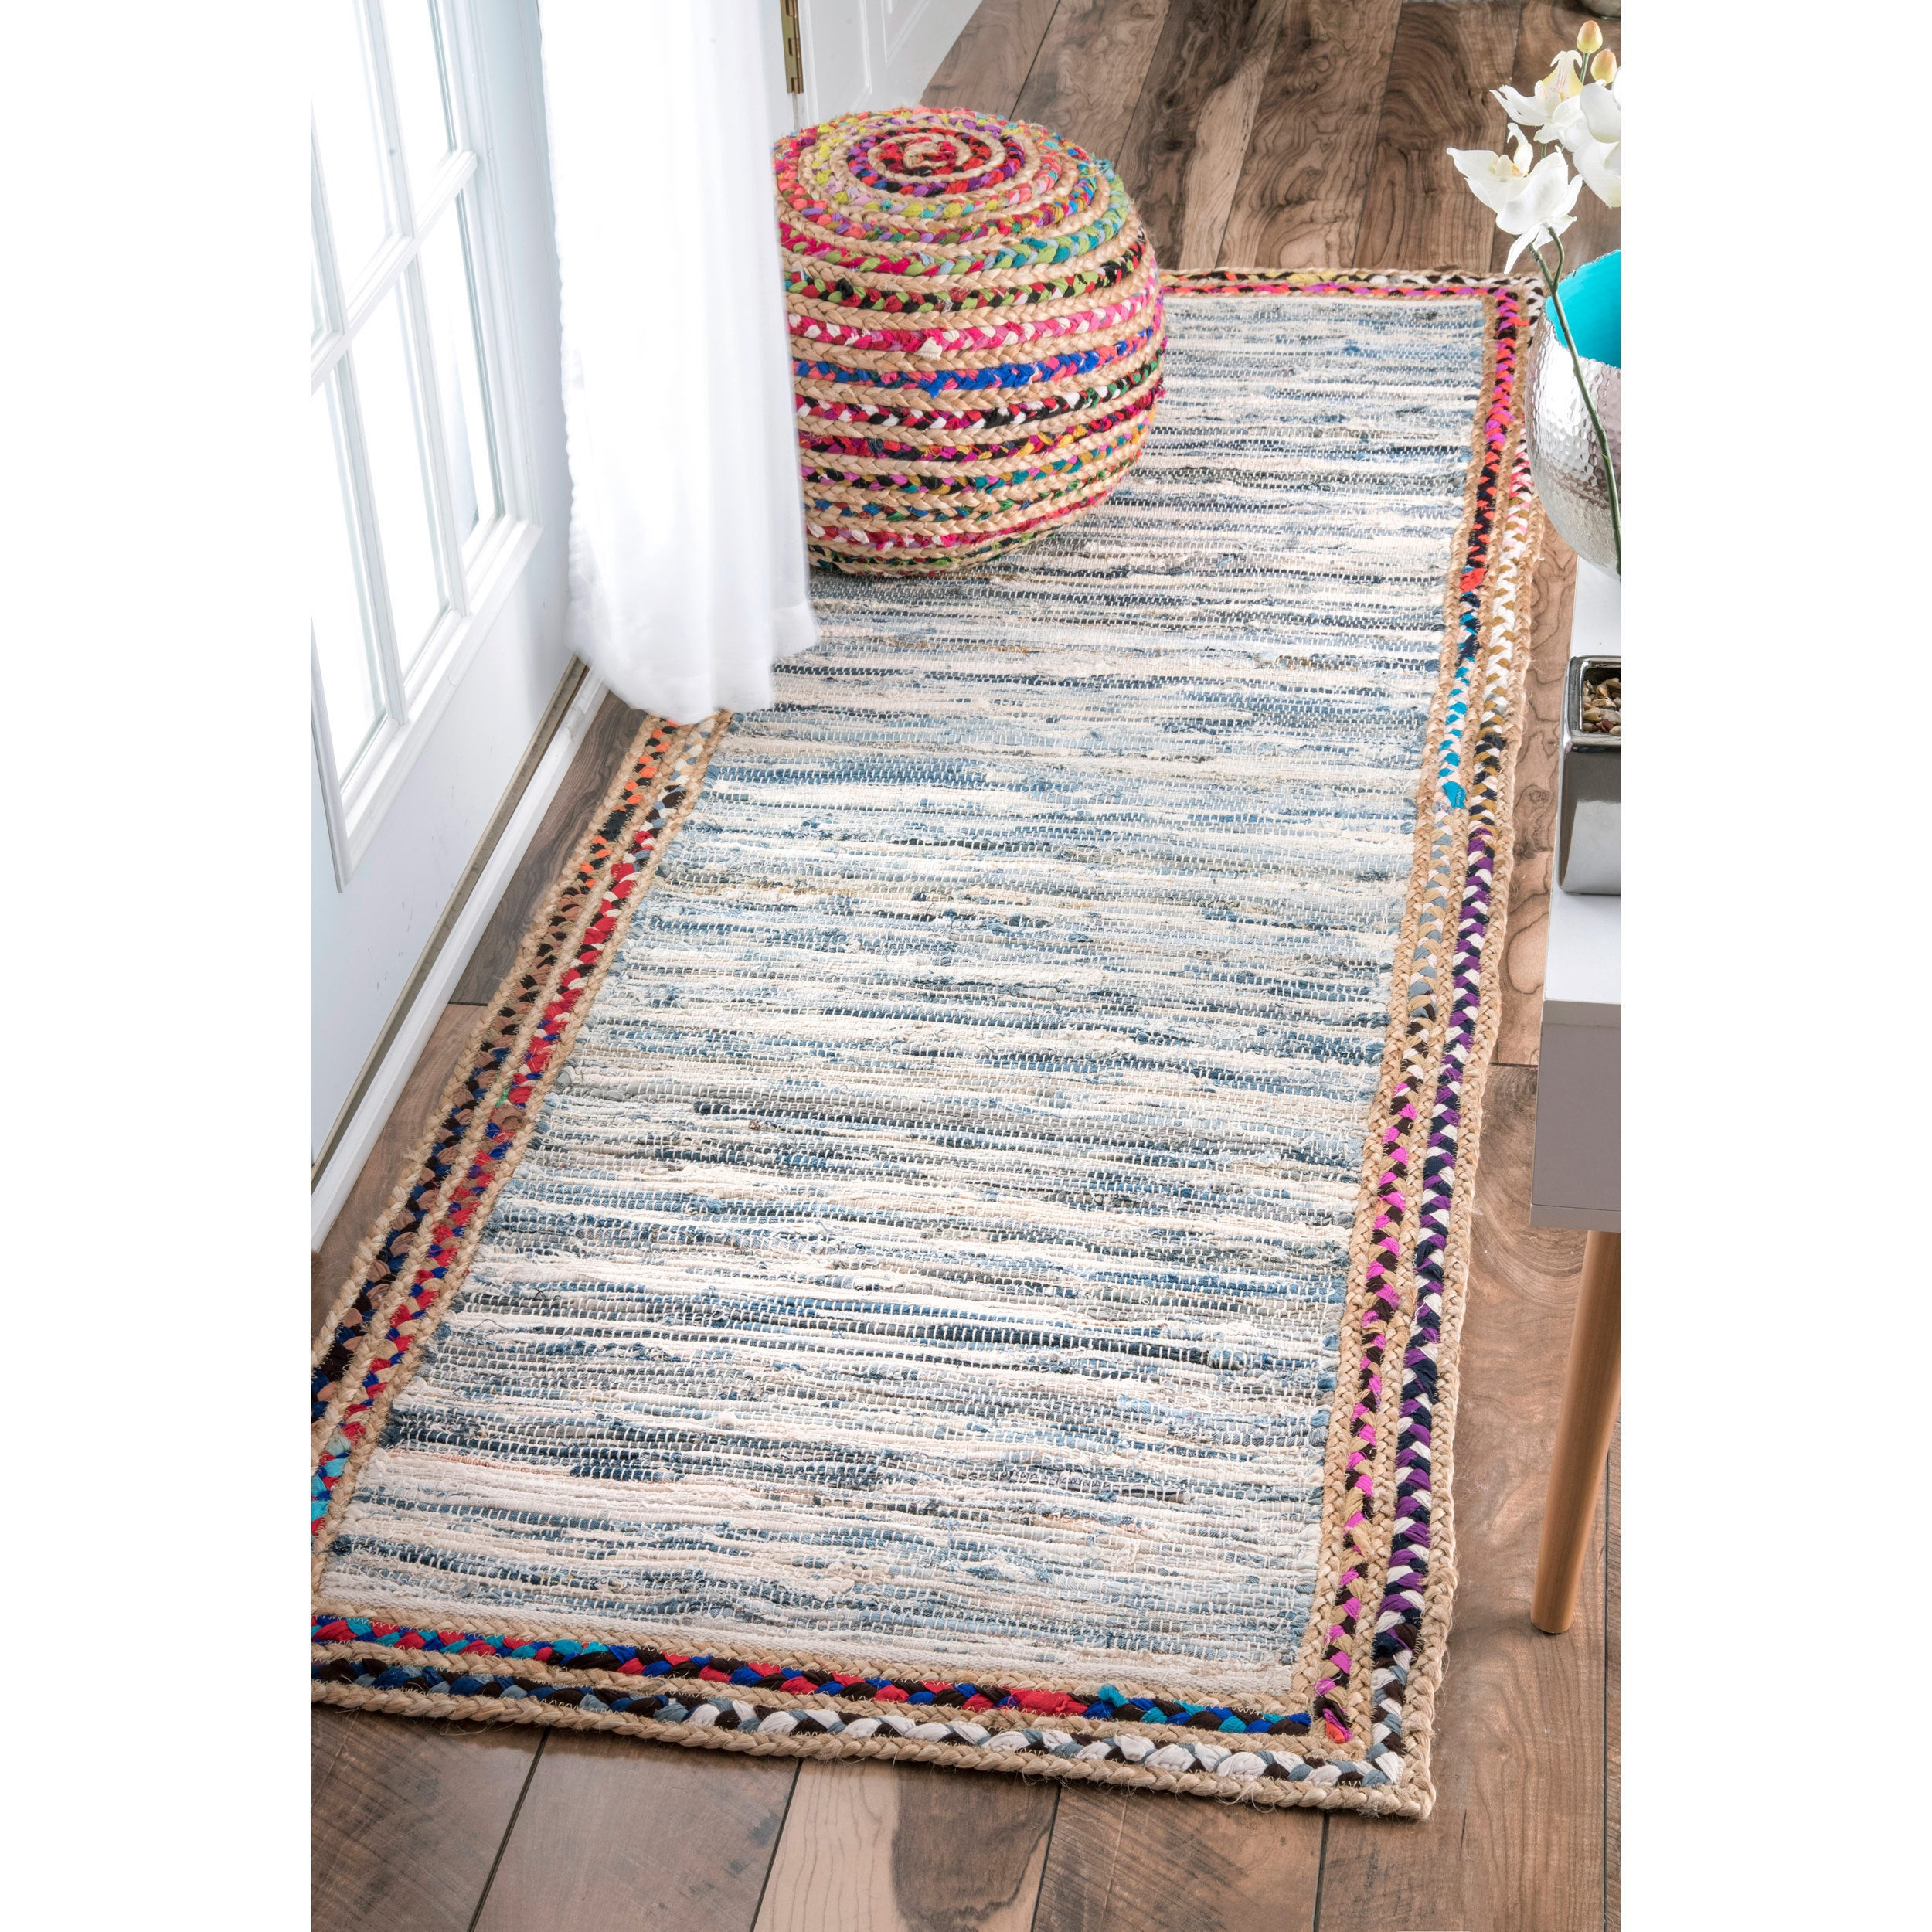 Nuloom Handmade Woven Striped Denim Rag Area Rug